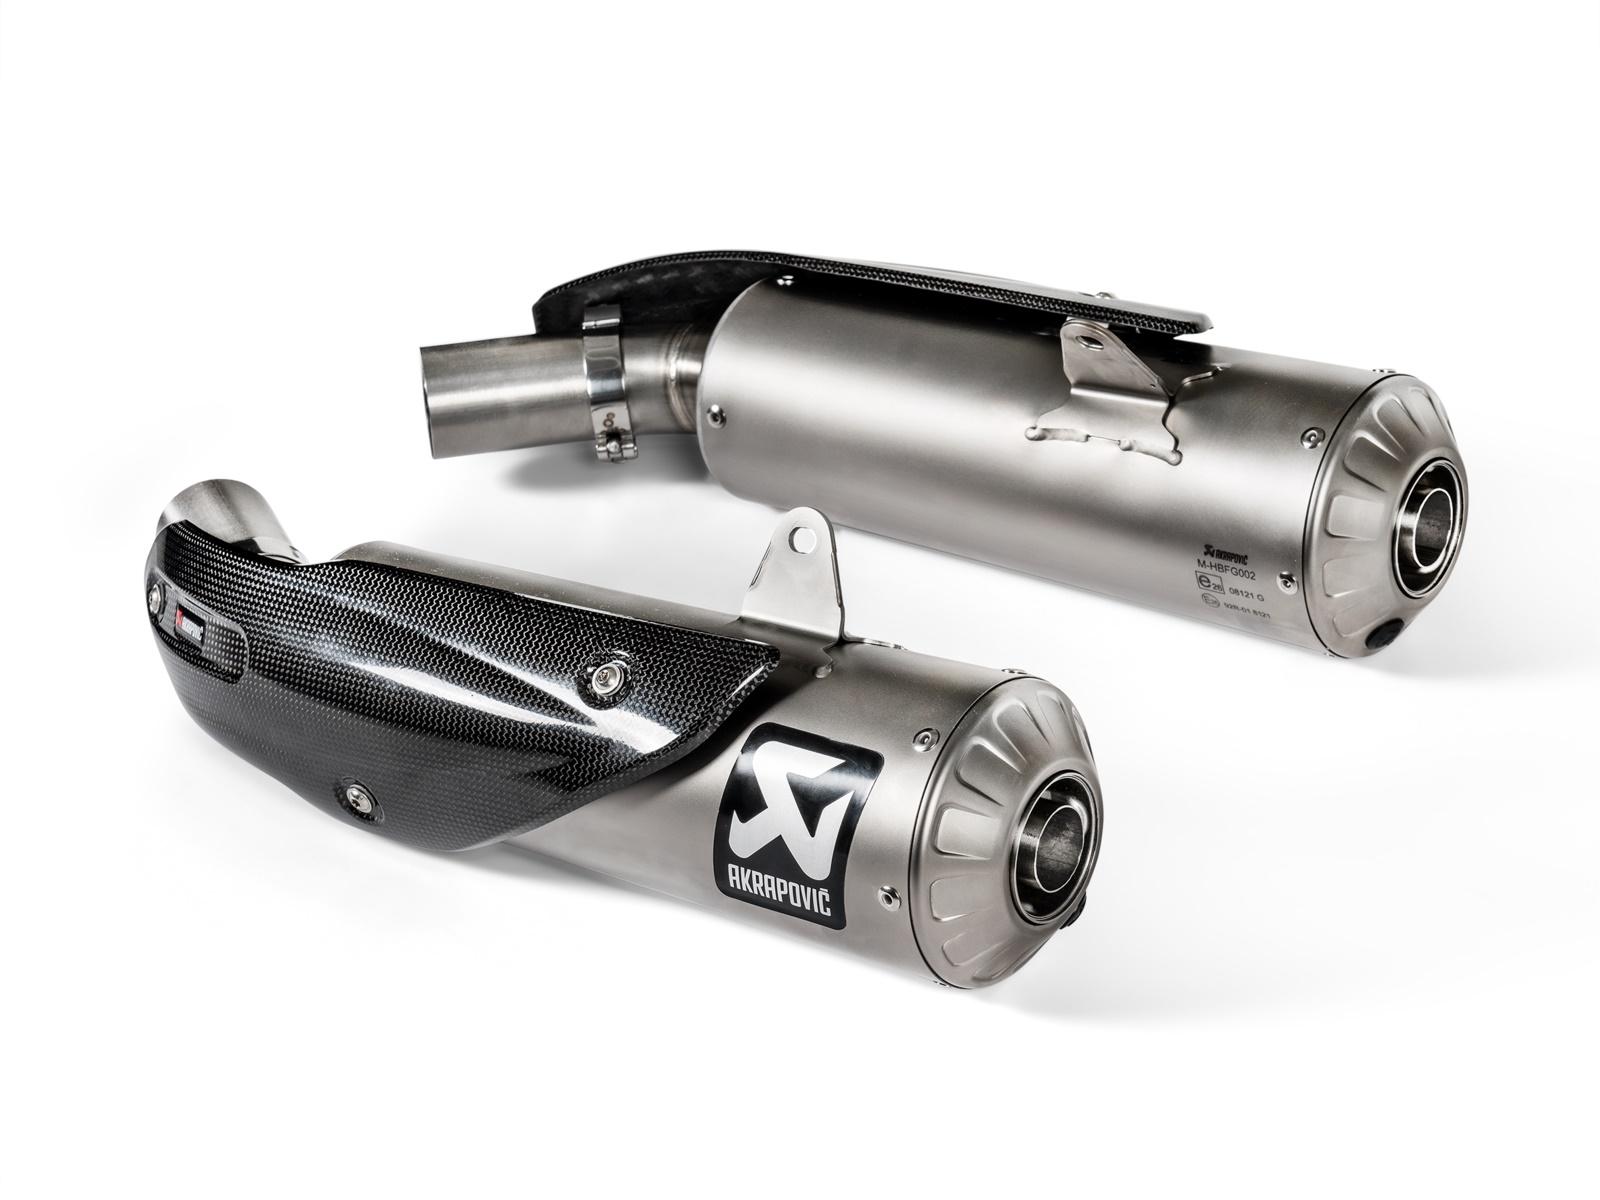 Akrapovic Ducati Scrambler 1100 18-19 Slip-On Exhaust System